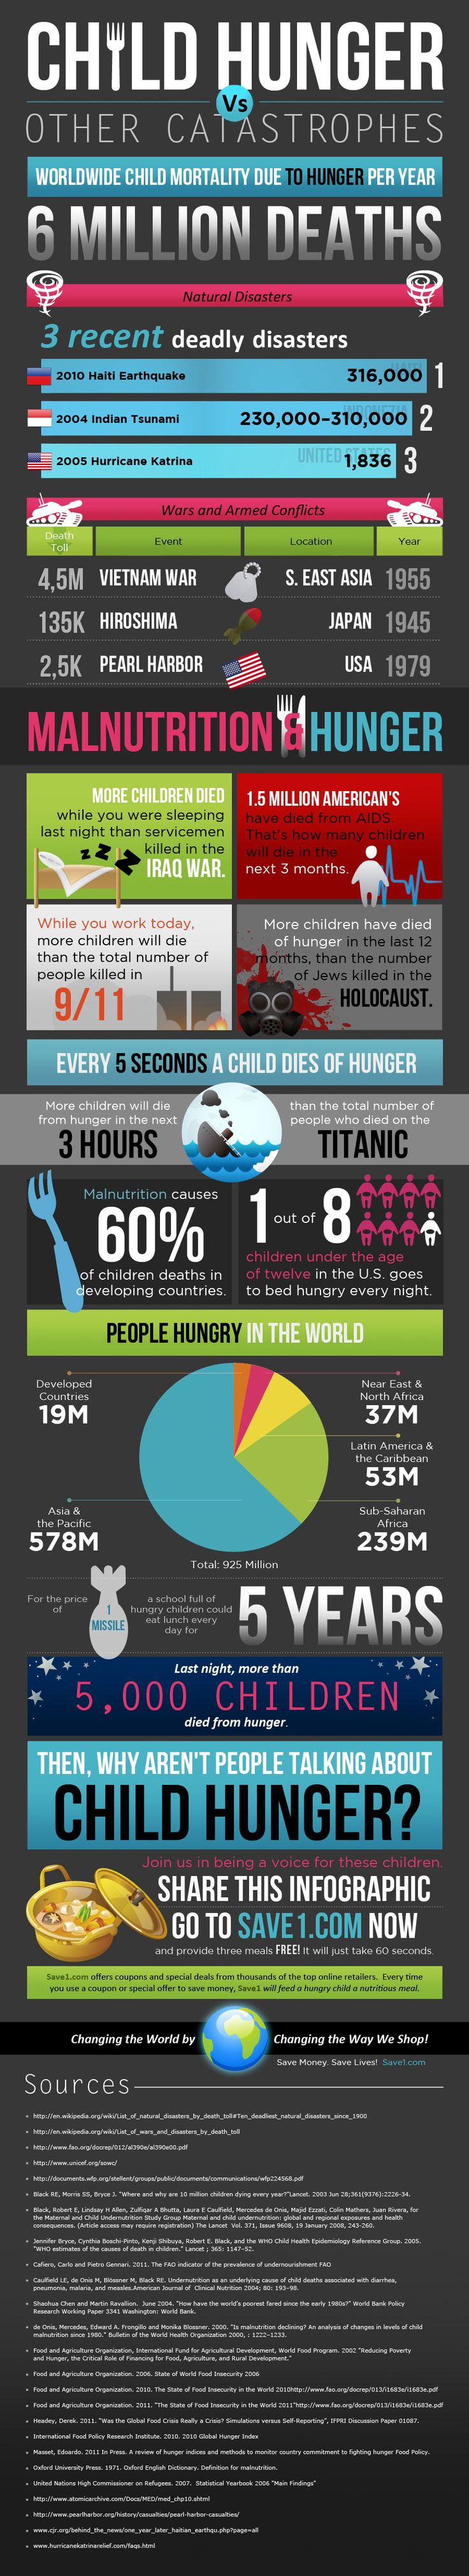 Child Hunger Infographic